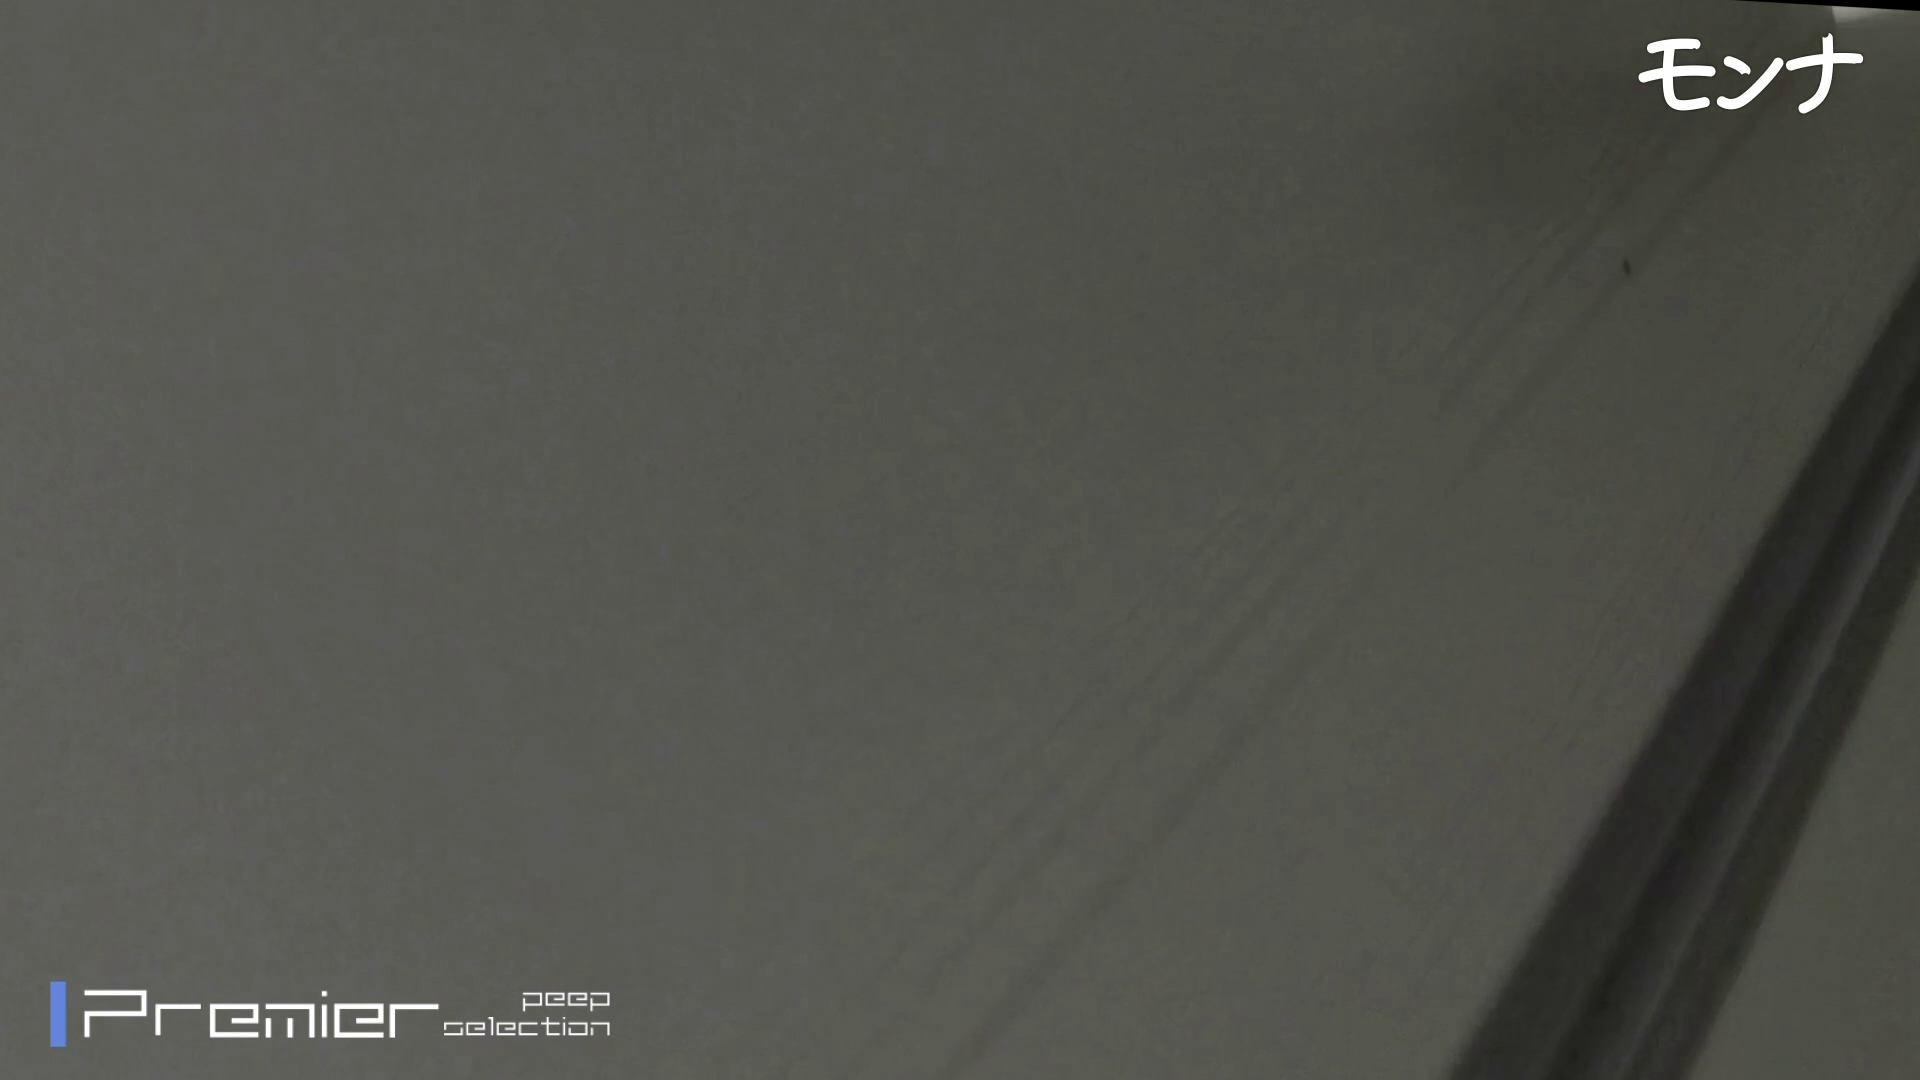 CM 悶絶シリーズ5 【美しい日本の未来 No.128】 高評価 おめこ無修正画像 111枚 78